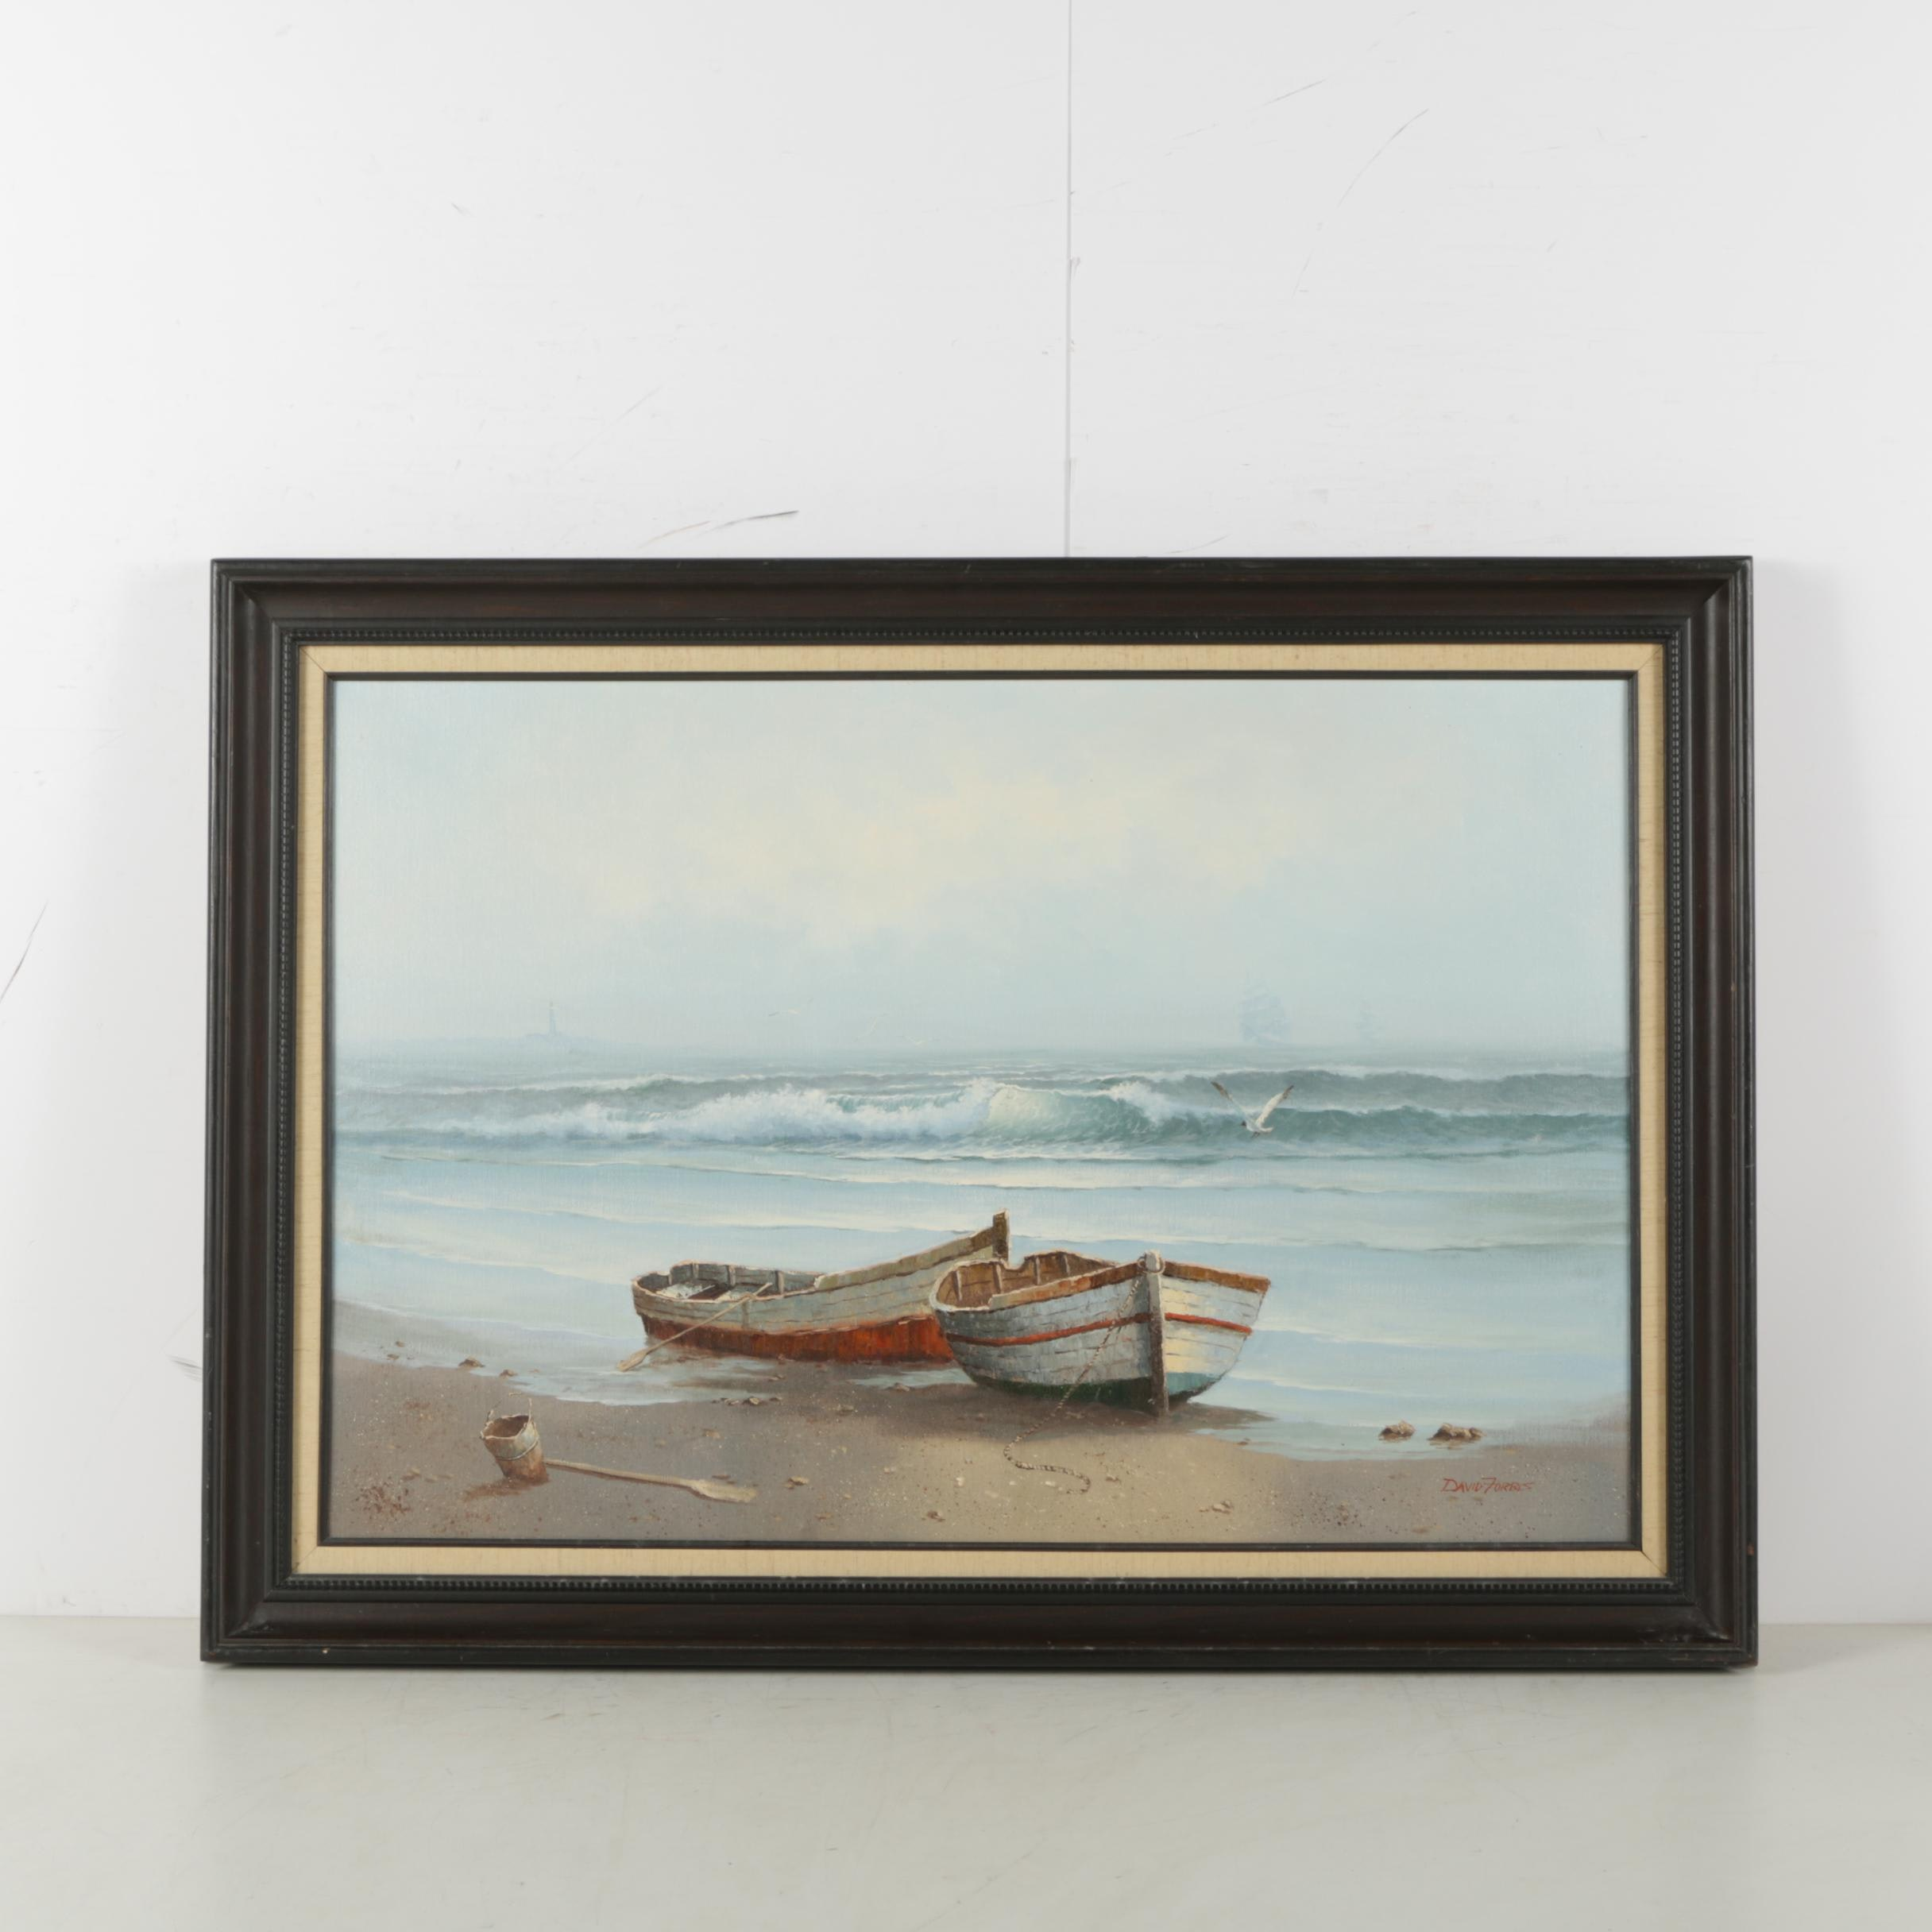 David Forbis Oil Painting of Coastal Scene